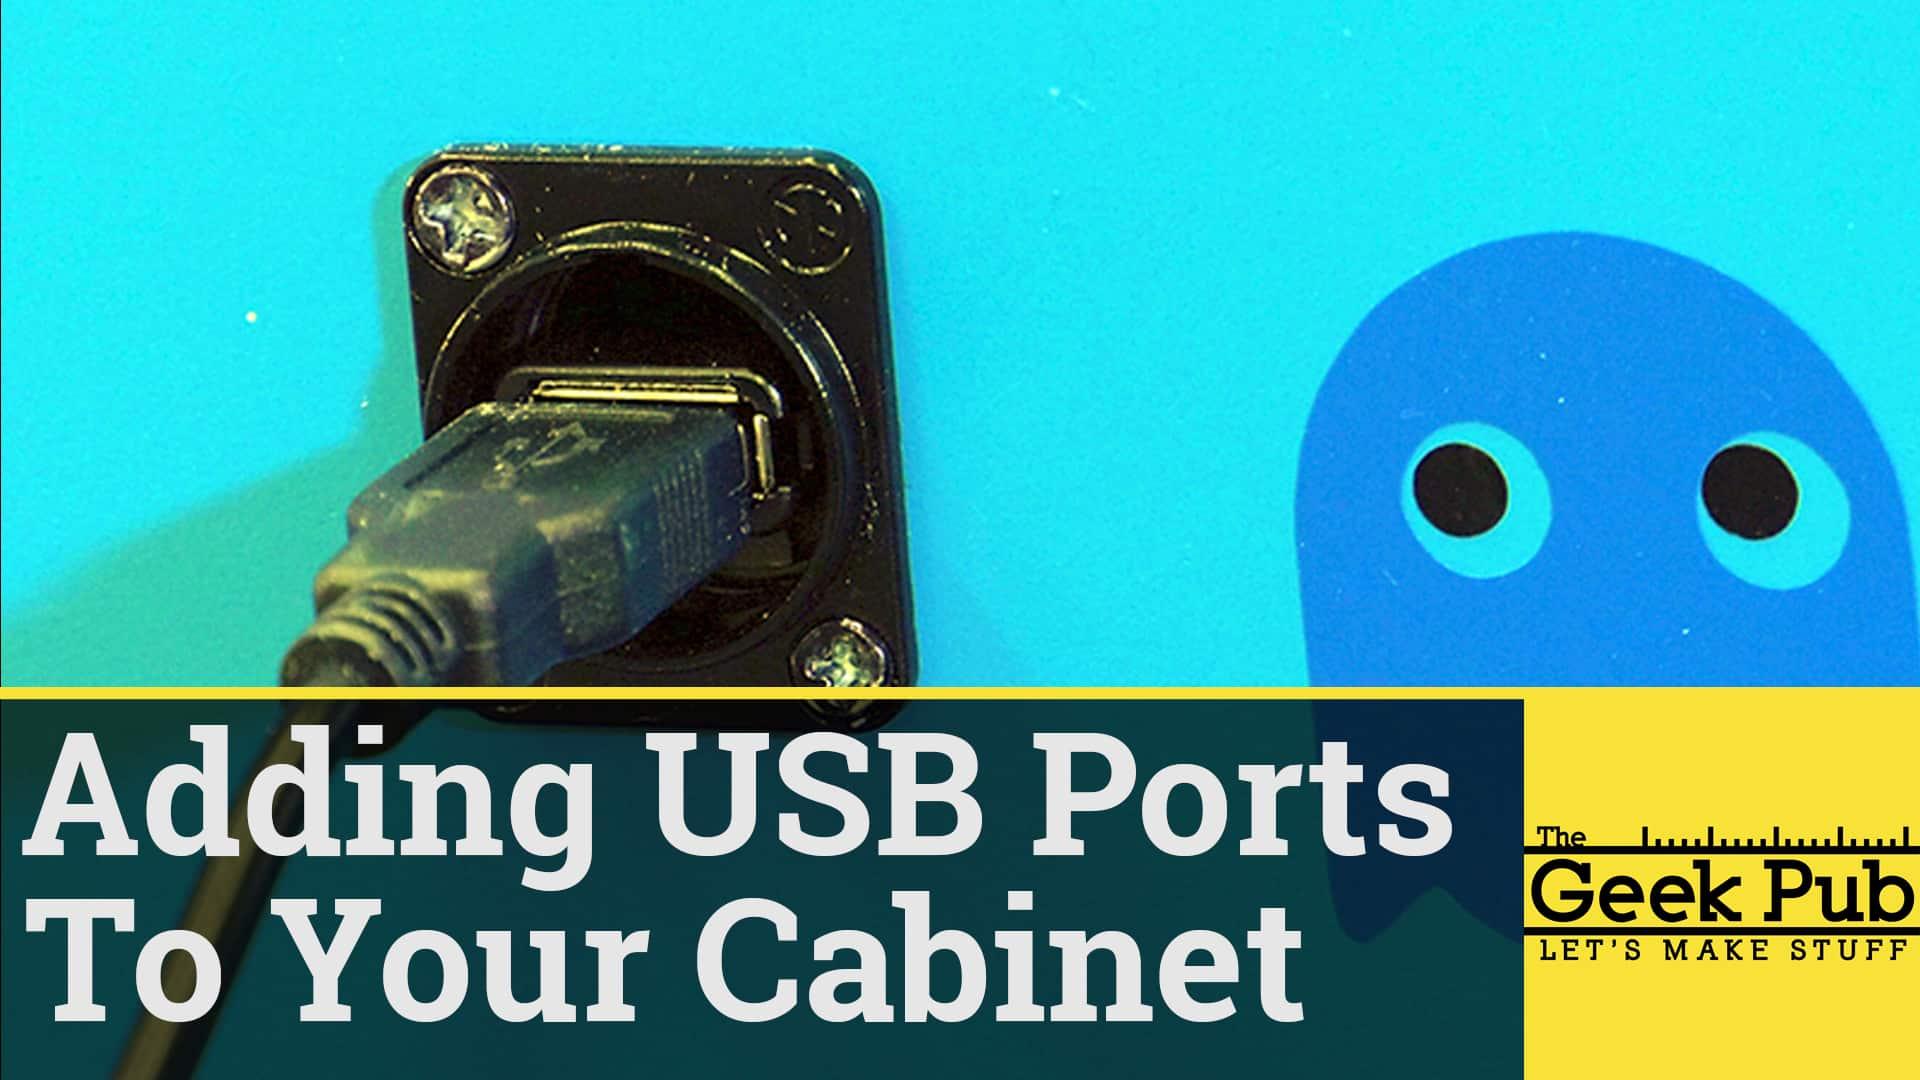 Installing USB Ports